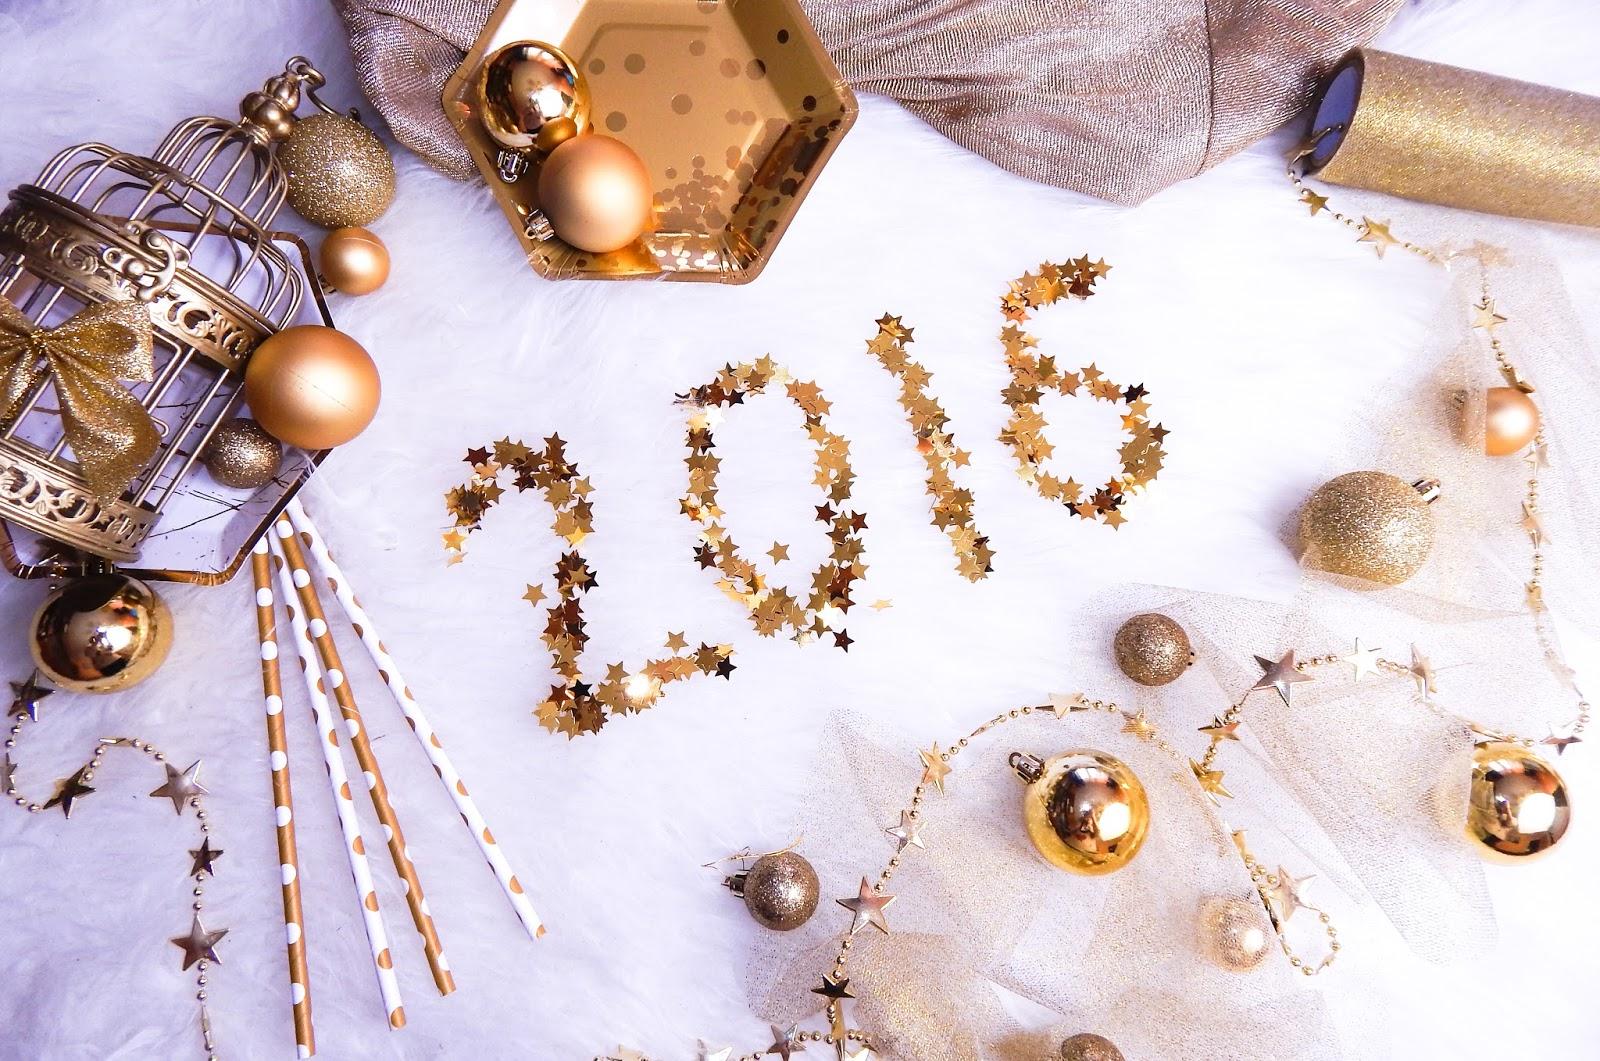 1 melodylaniella podsumowanie roku moj rok 2016 rabble party box blog lifestyle